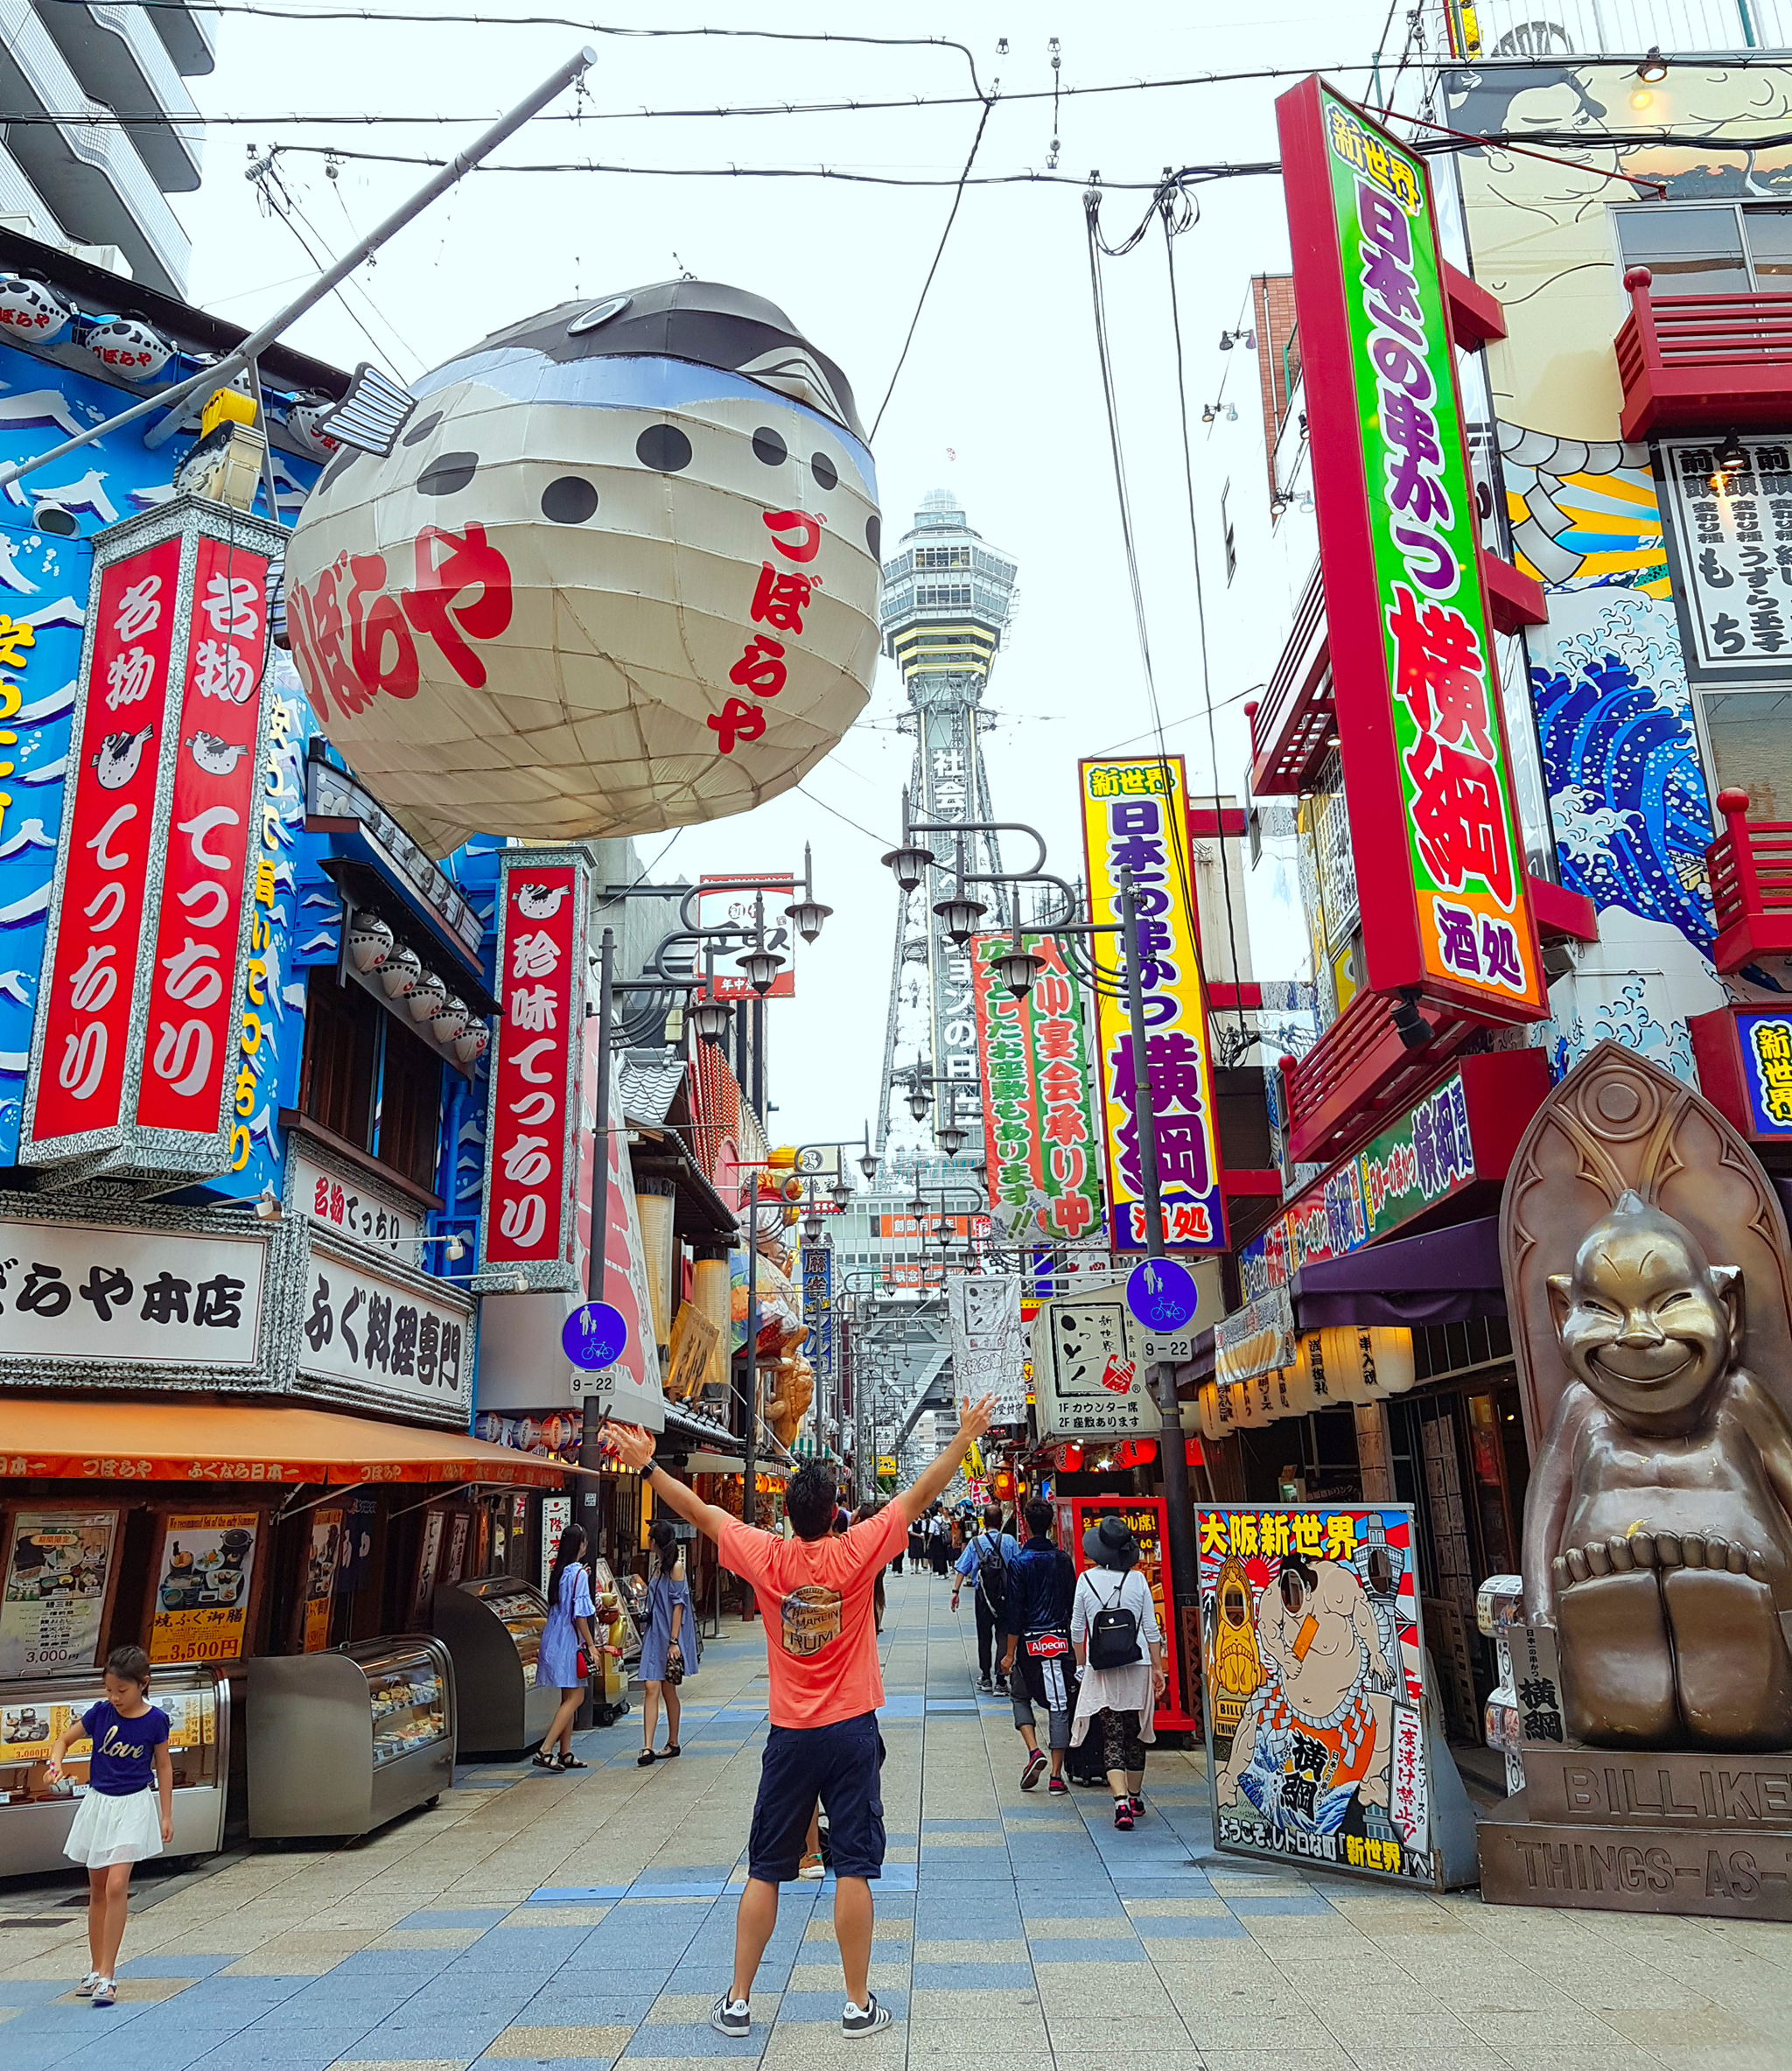 Osaka - Torre de Tsutenkaku - Viajar a Japón - ruta por Japón en dos semanas ruta por japón en dos semanas - 36507660700 452f2c21a7 o - Nuestra Ruta por Japón en dos semanas (Diario de Viaje a Japón)